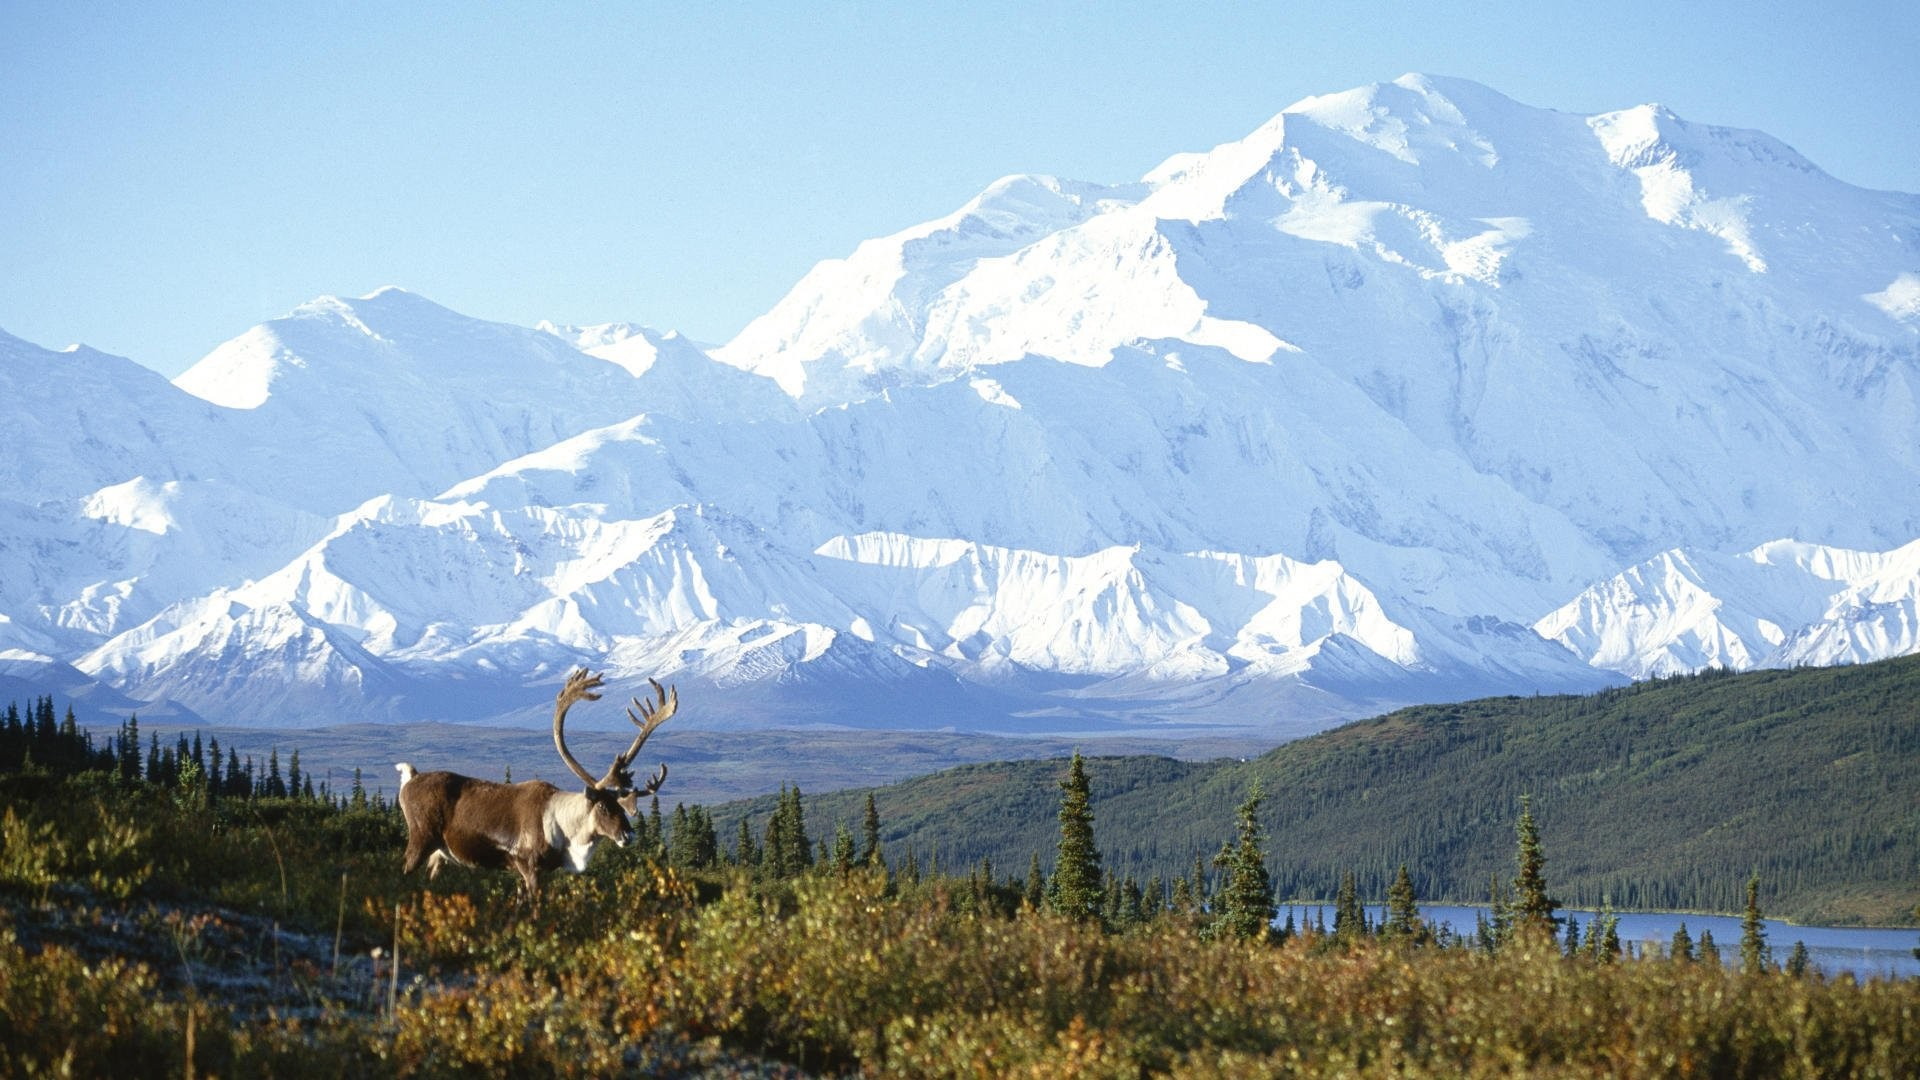 Alaska Wallpaper (56 Wallpapers)